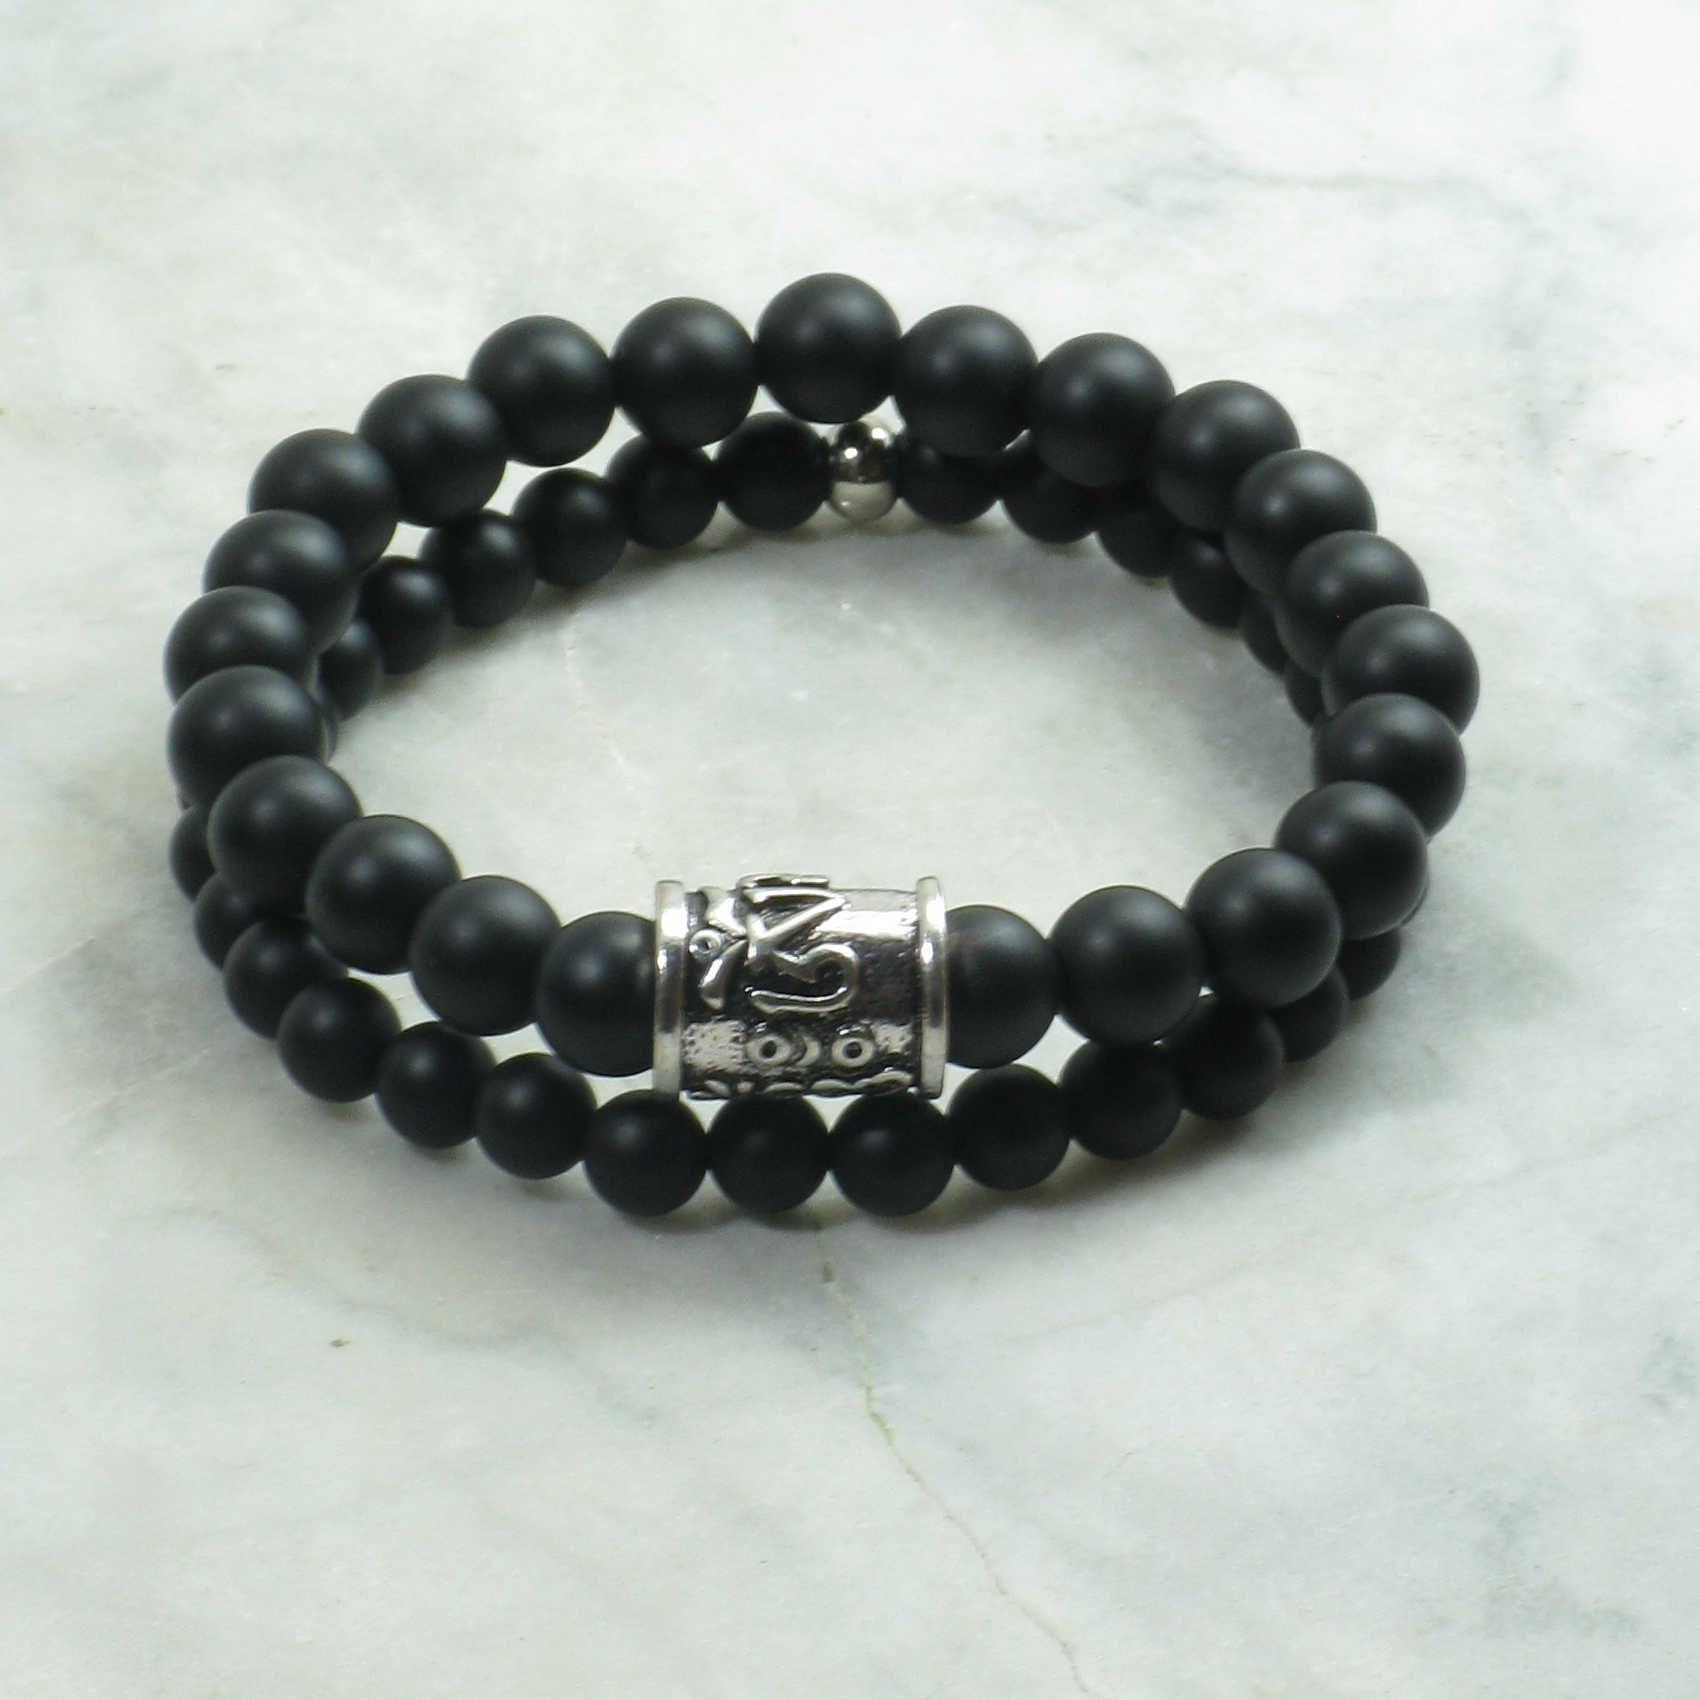 Pin By Salt Spring Malas Yoga Jewelry On Bracelets For Men S Stainless Steel Spiritual Cross Black Beads Bracelet